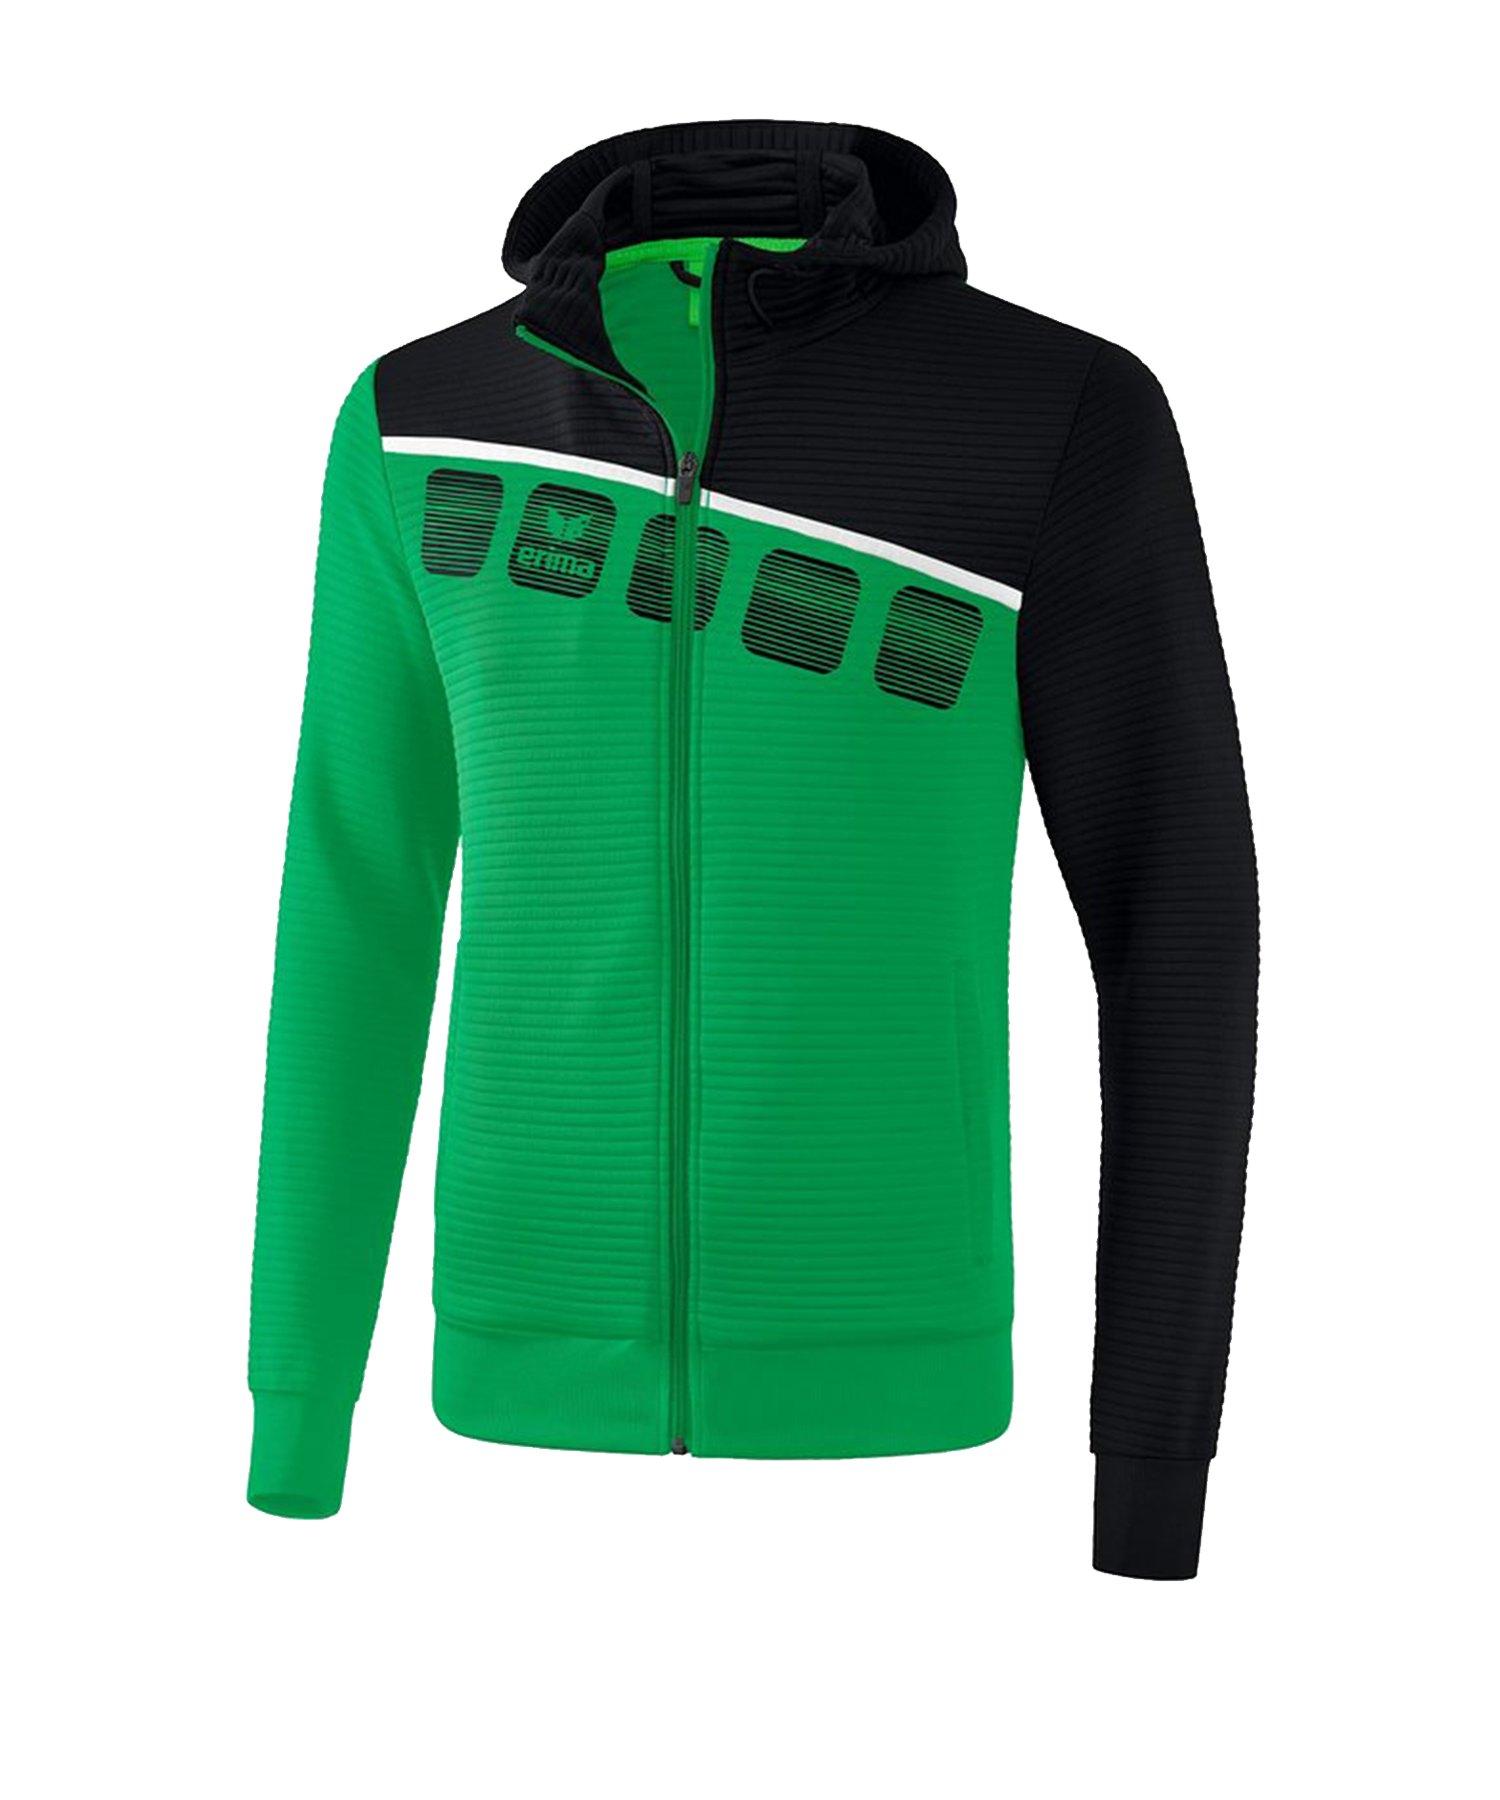 Erima 5-C Trainingsjacke mit Kapuze Grün Schwarz - Gruen